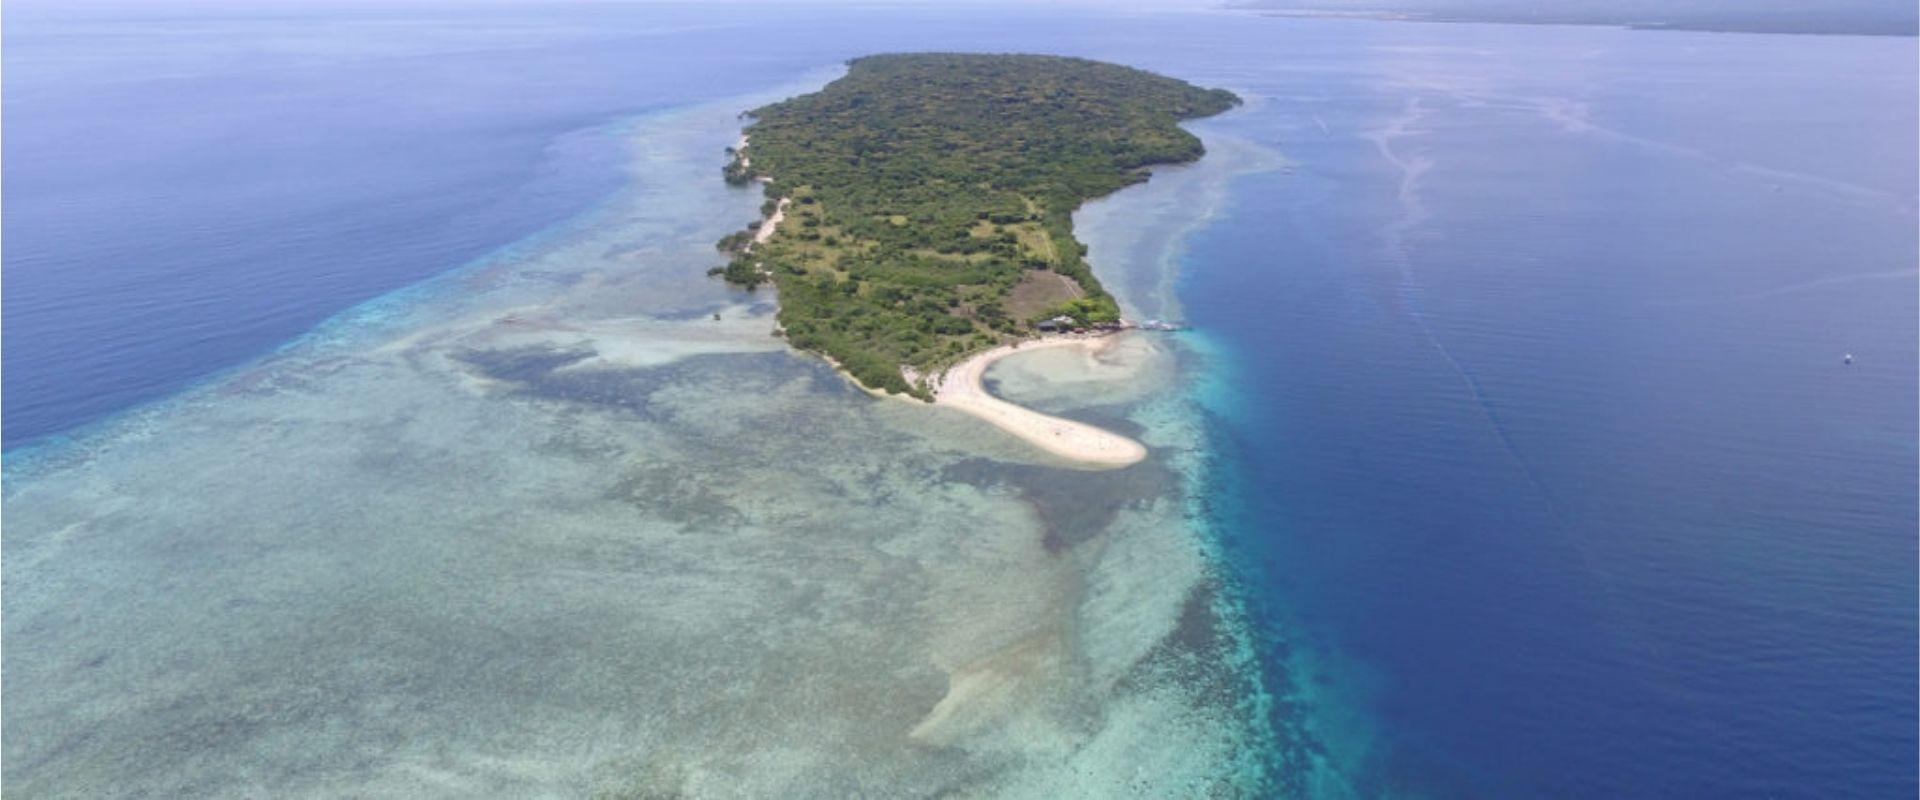 Islas Menjangan y Pemuteran blog